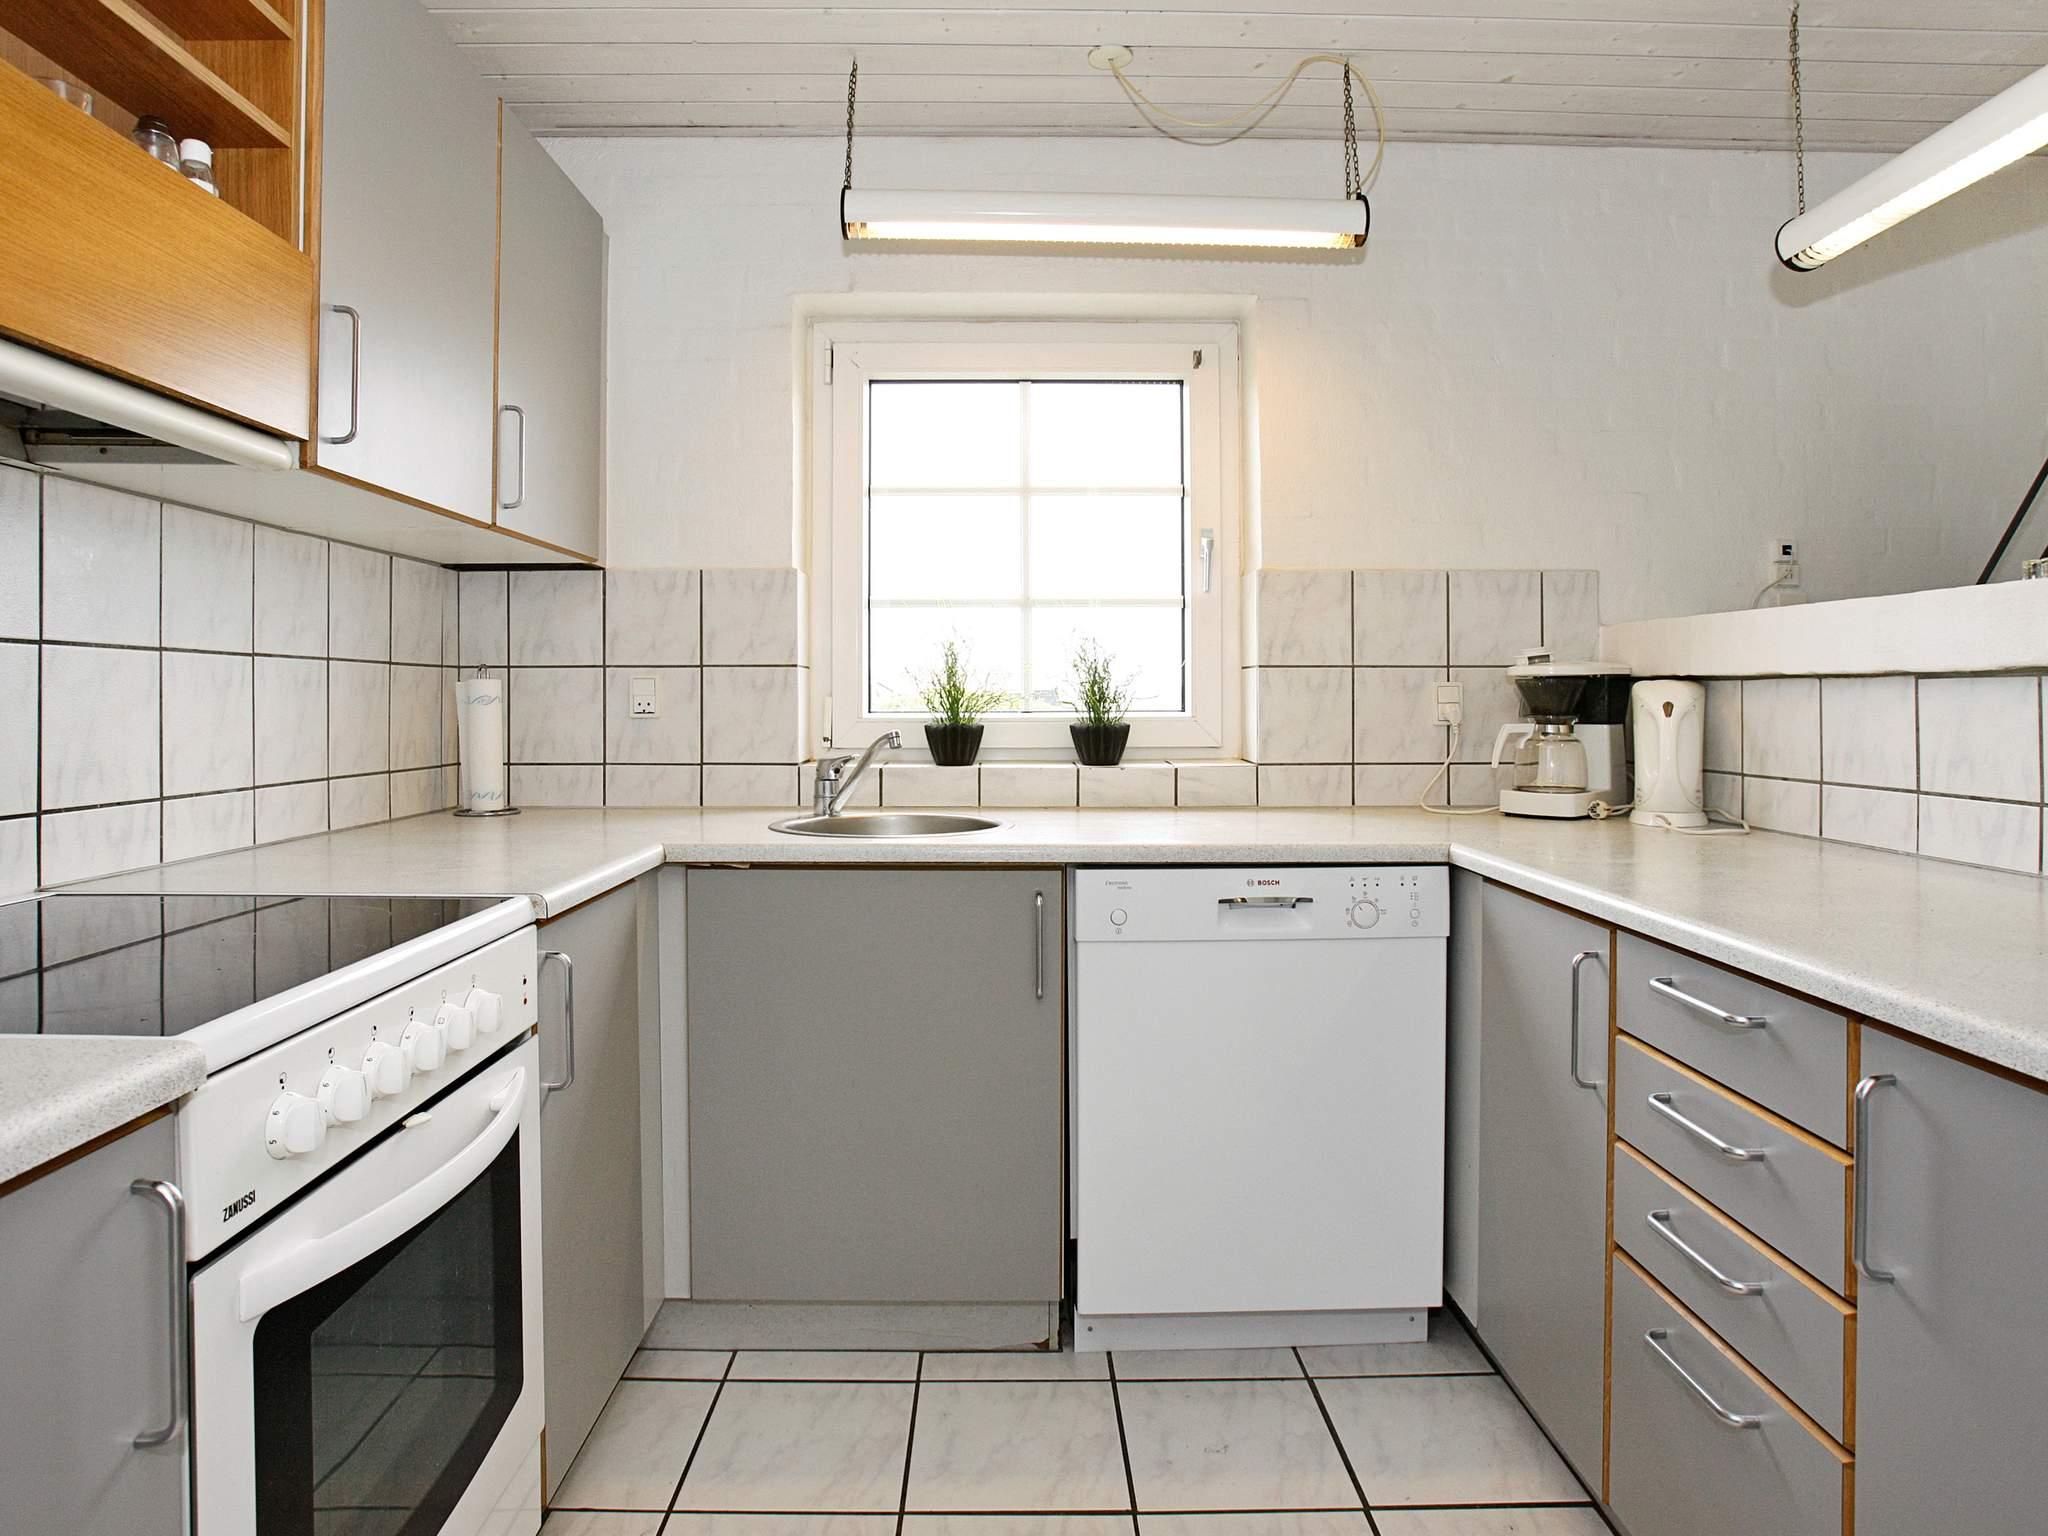 Ferienhaus Vrist (88916), Vrist, , Limfjord, Dänemark, Bild 7